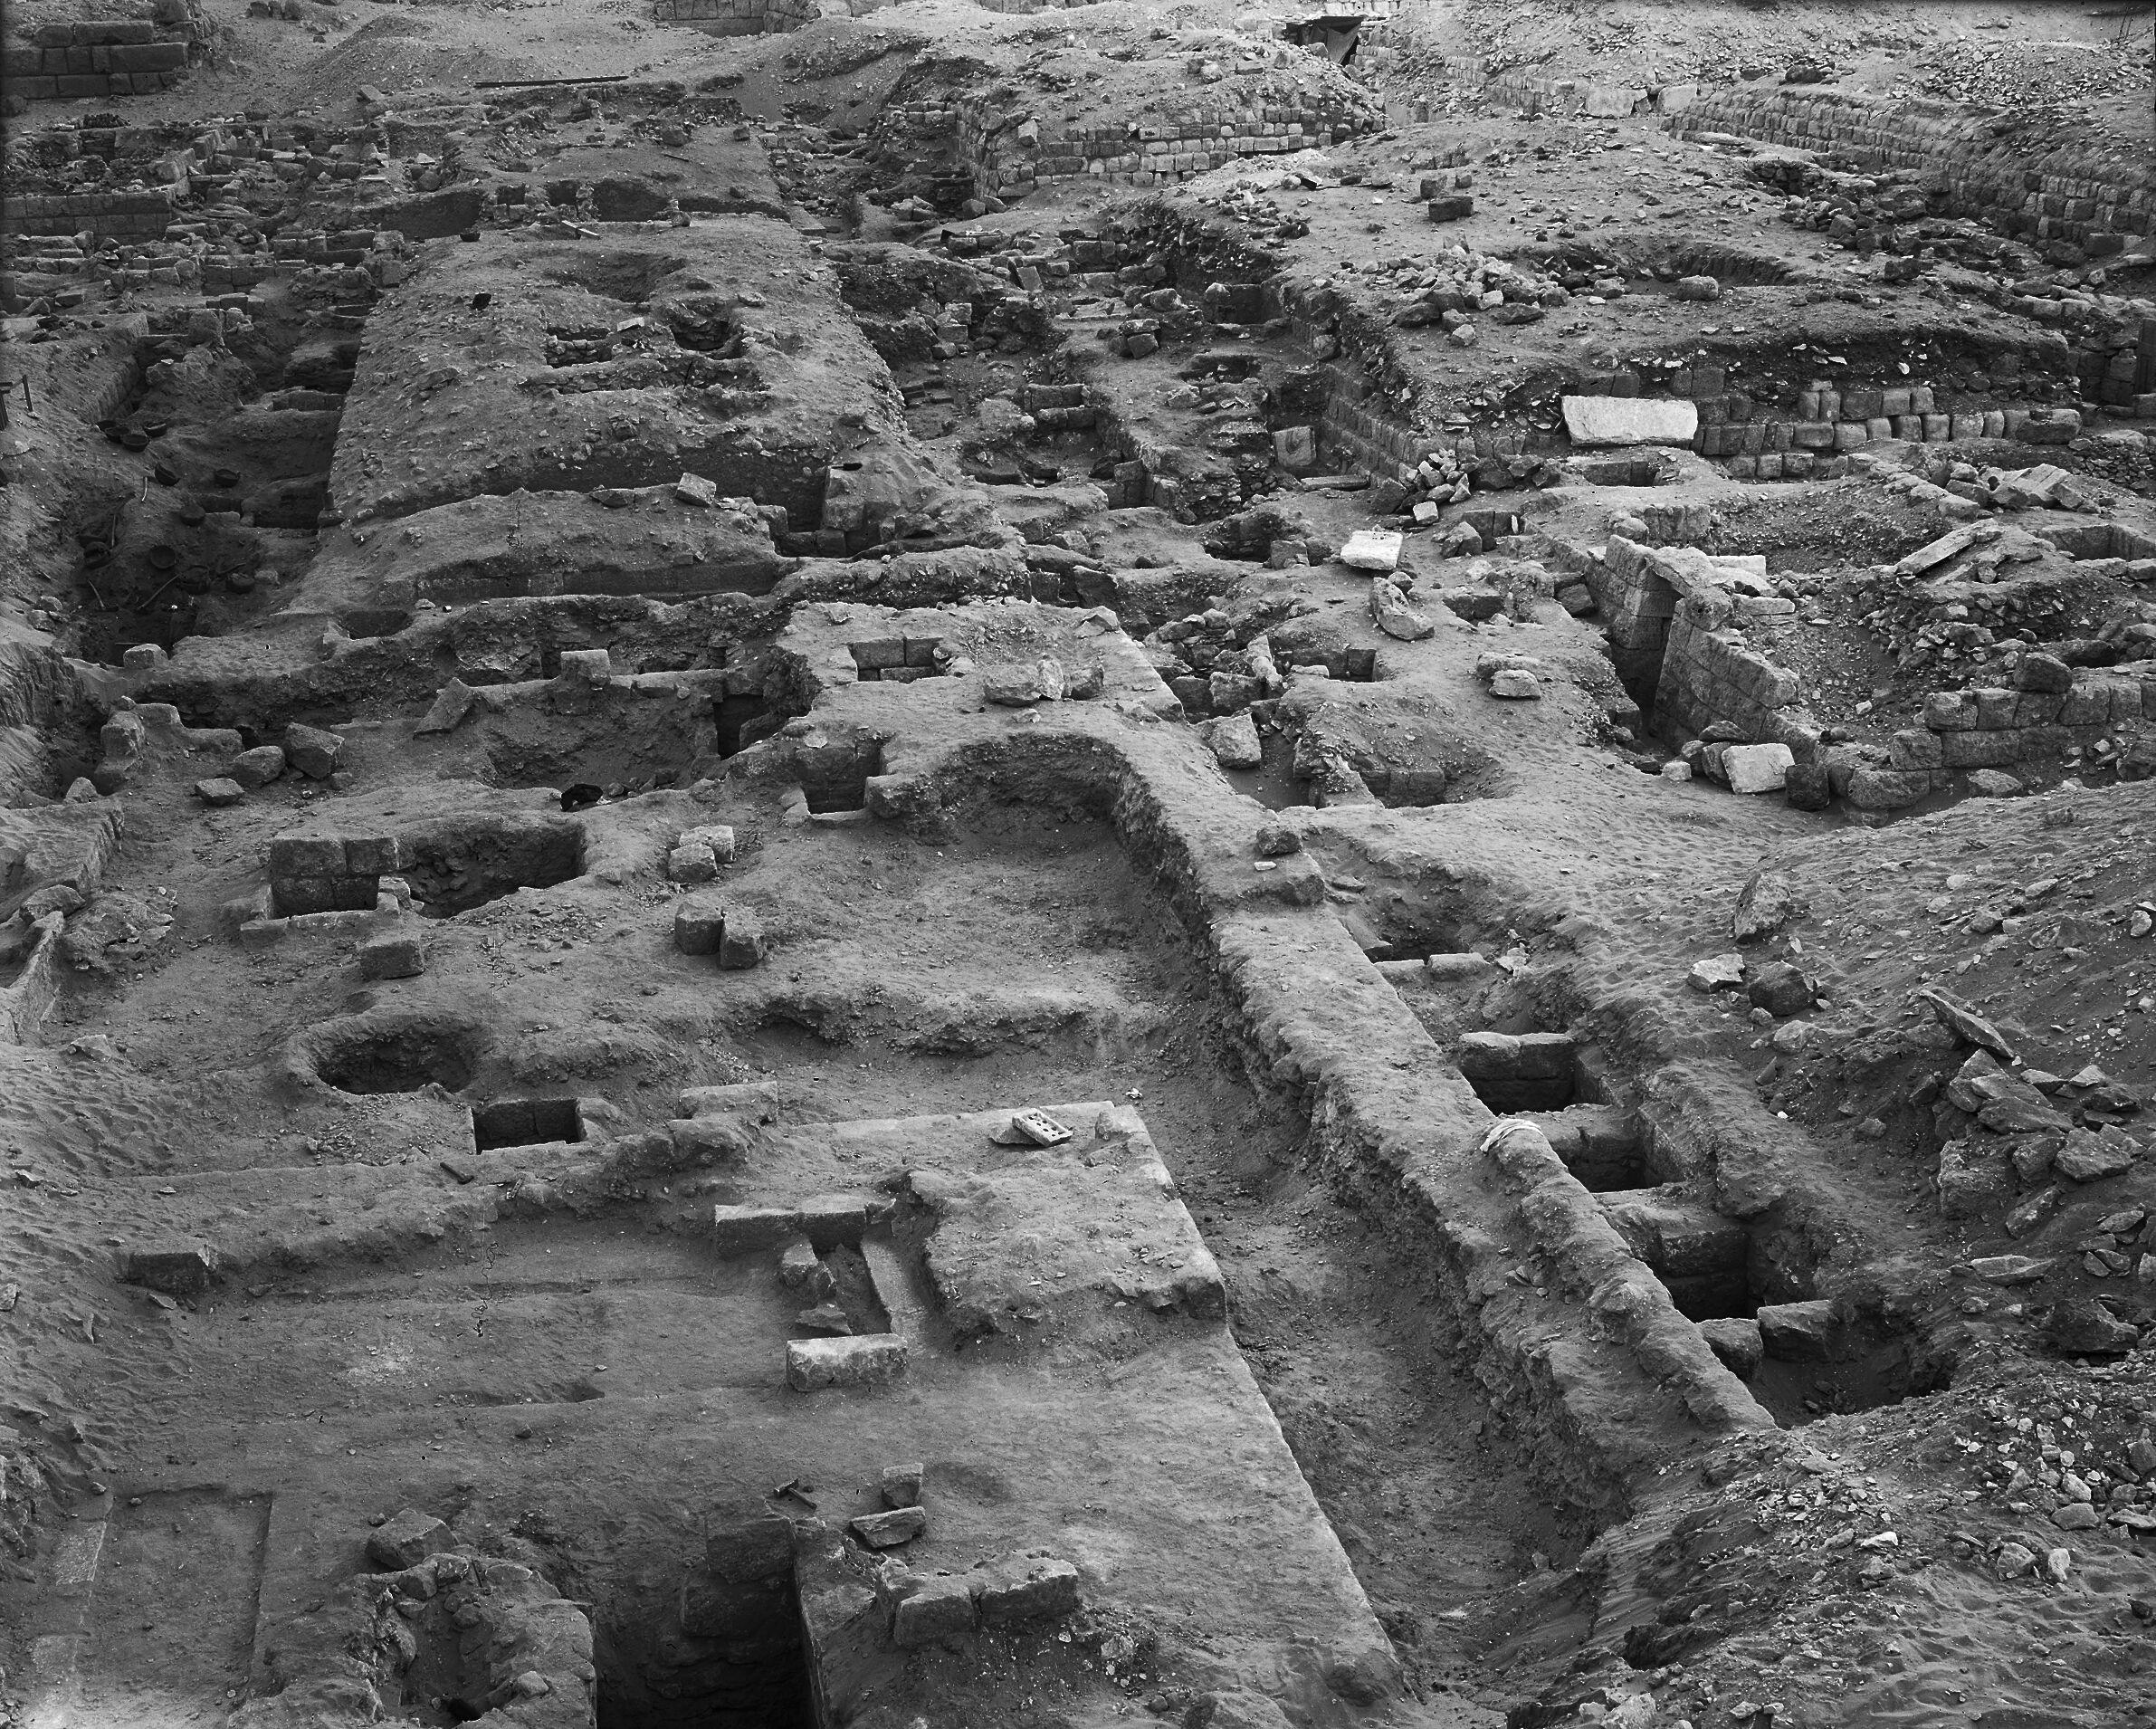 Western Cemetery: Site: Giza; View: G 2400, G 2350 = G 5290, G 2300 = G 5190, G 2198, G 2197